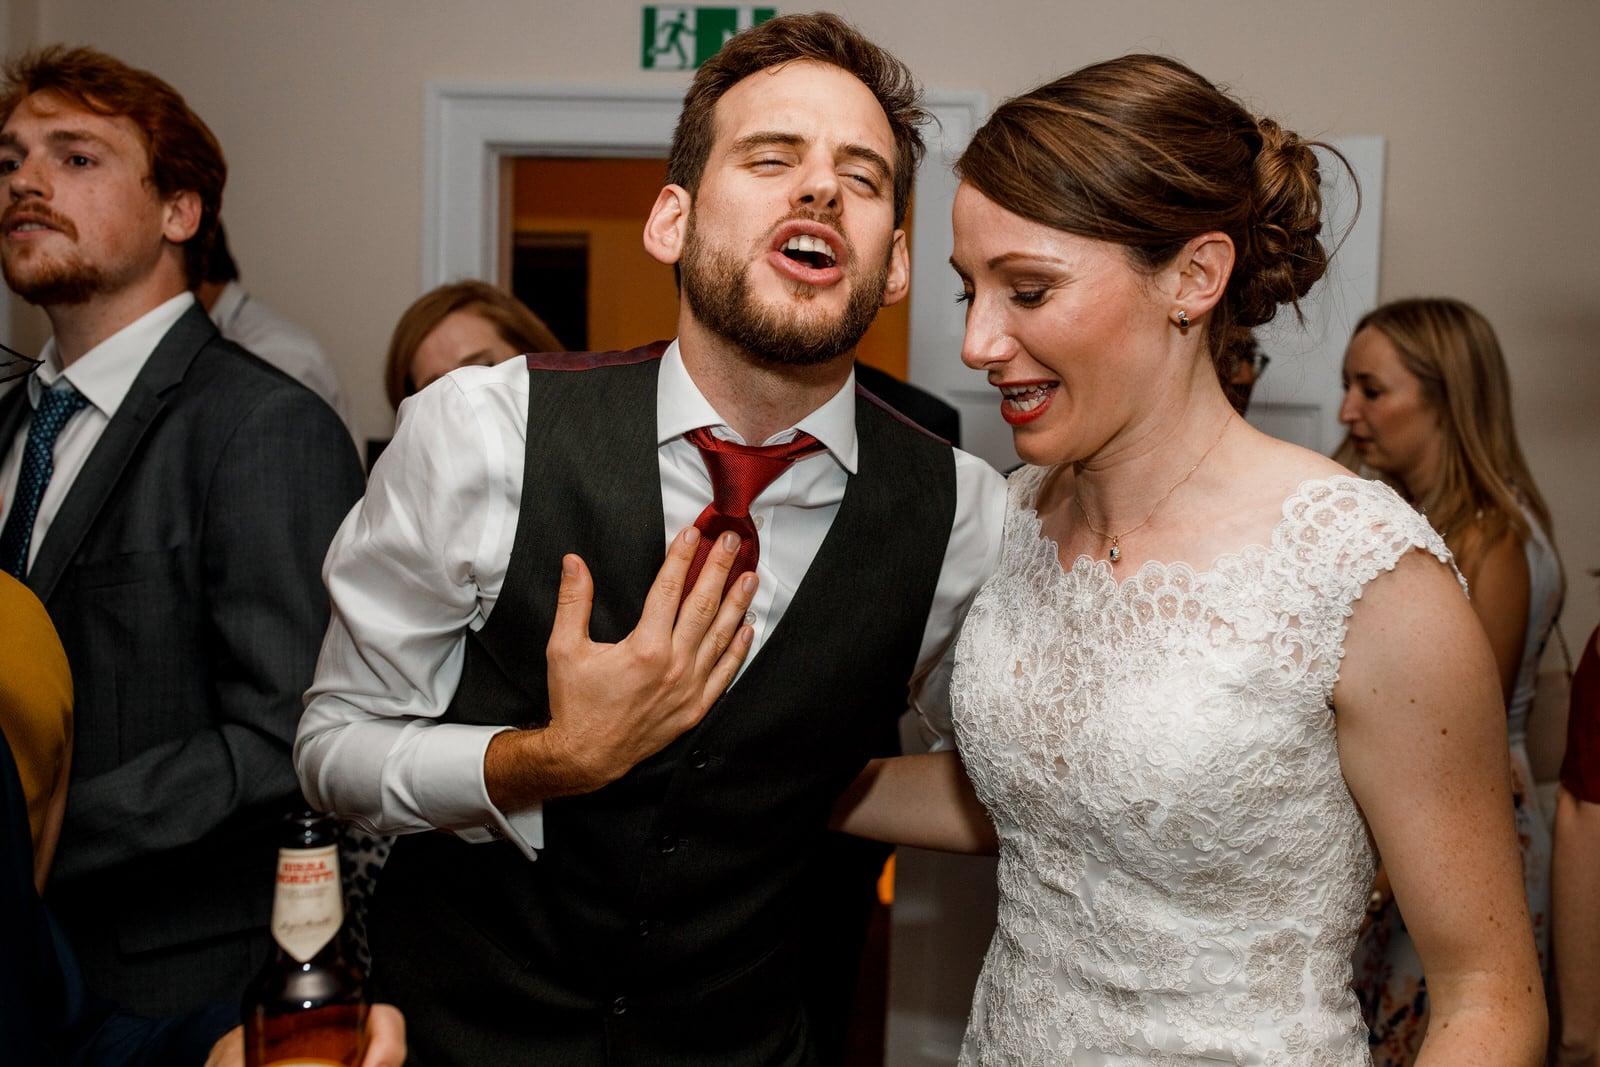 bride and groom dancing on floor at wedding